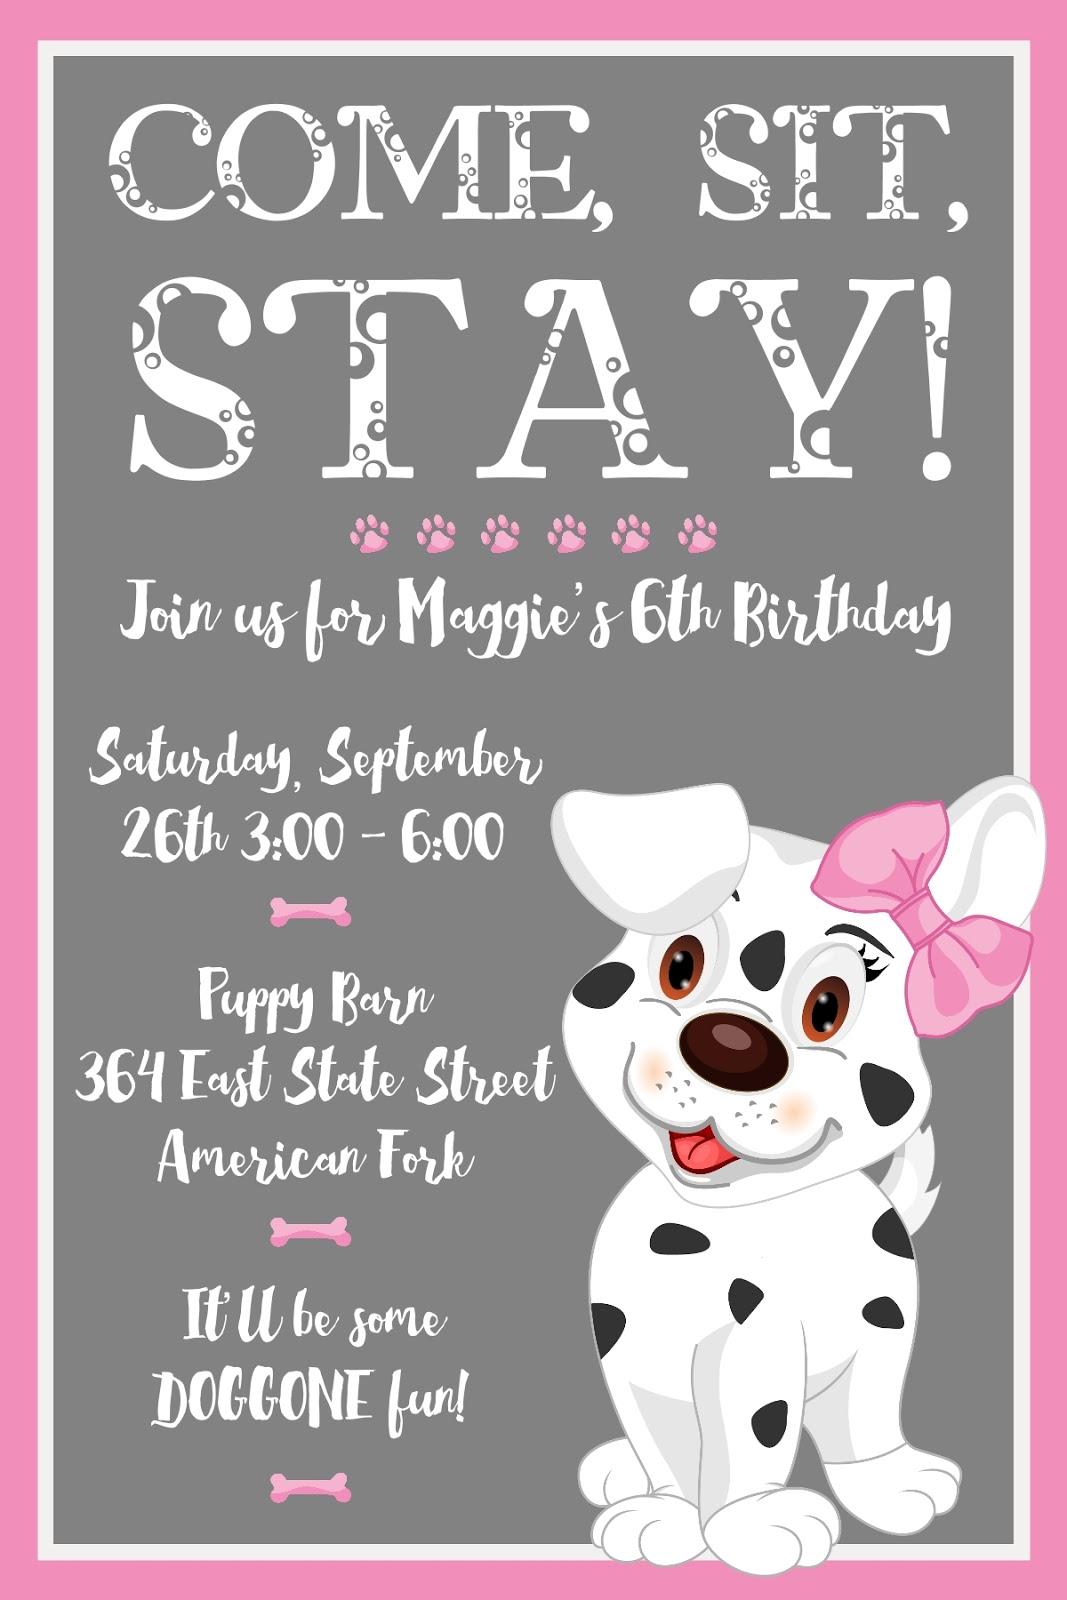 puppy party invitations  ukrobstep, invitation samples